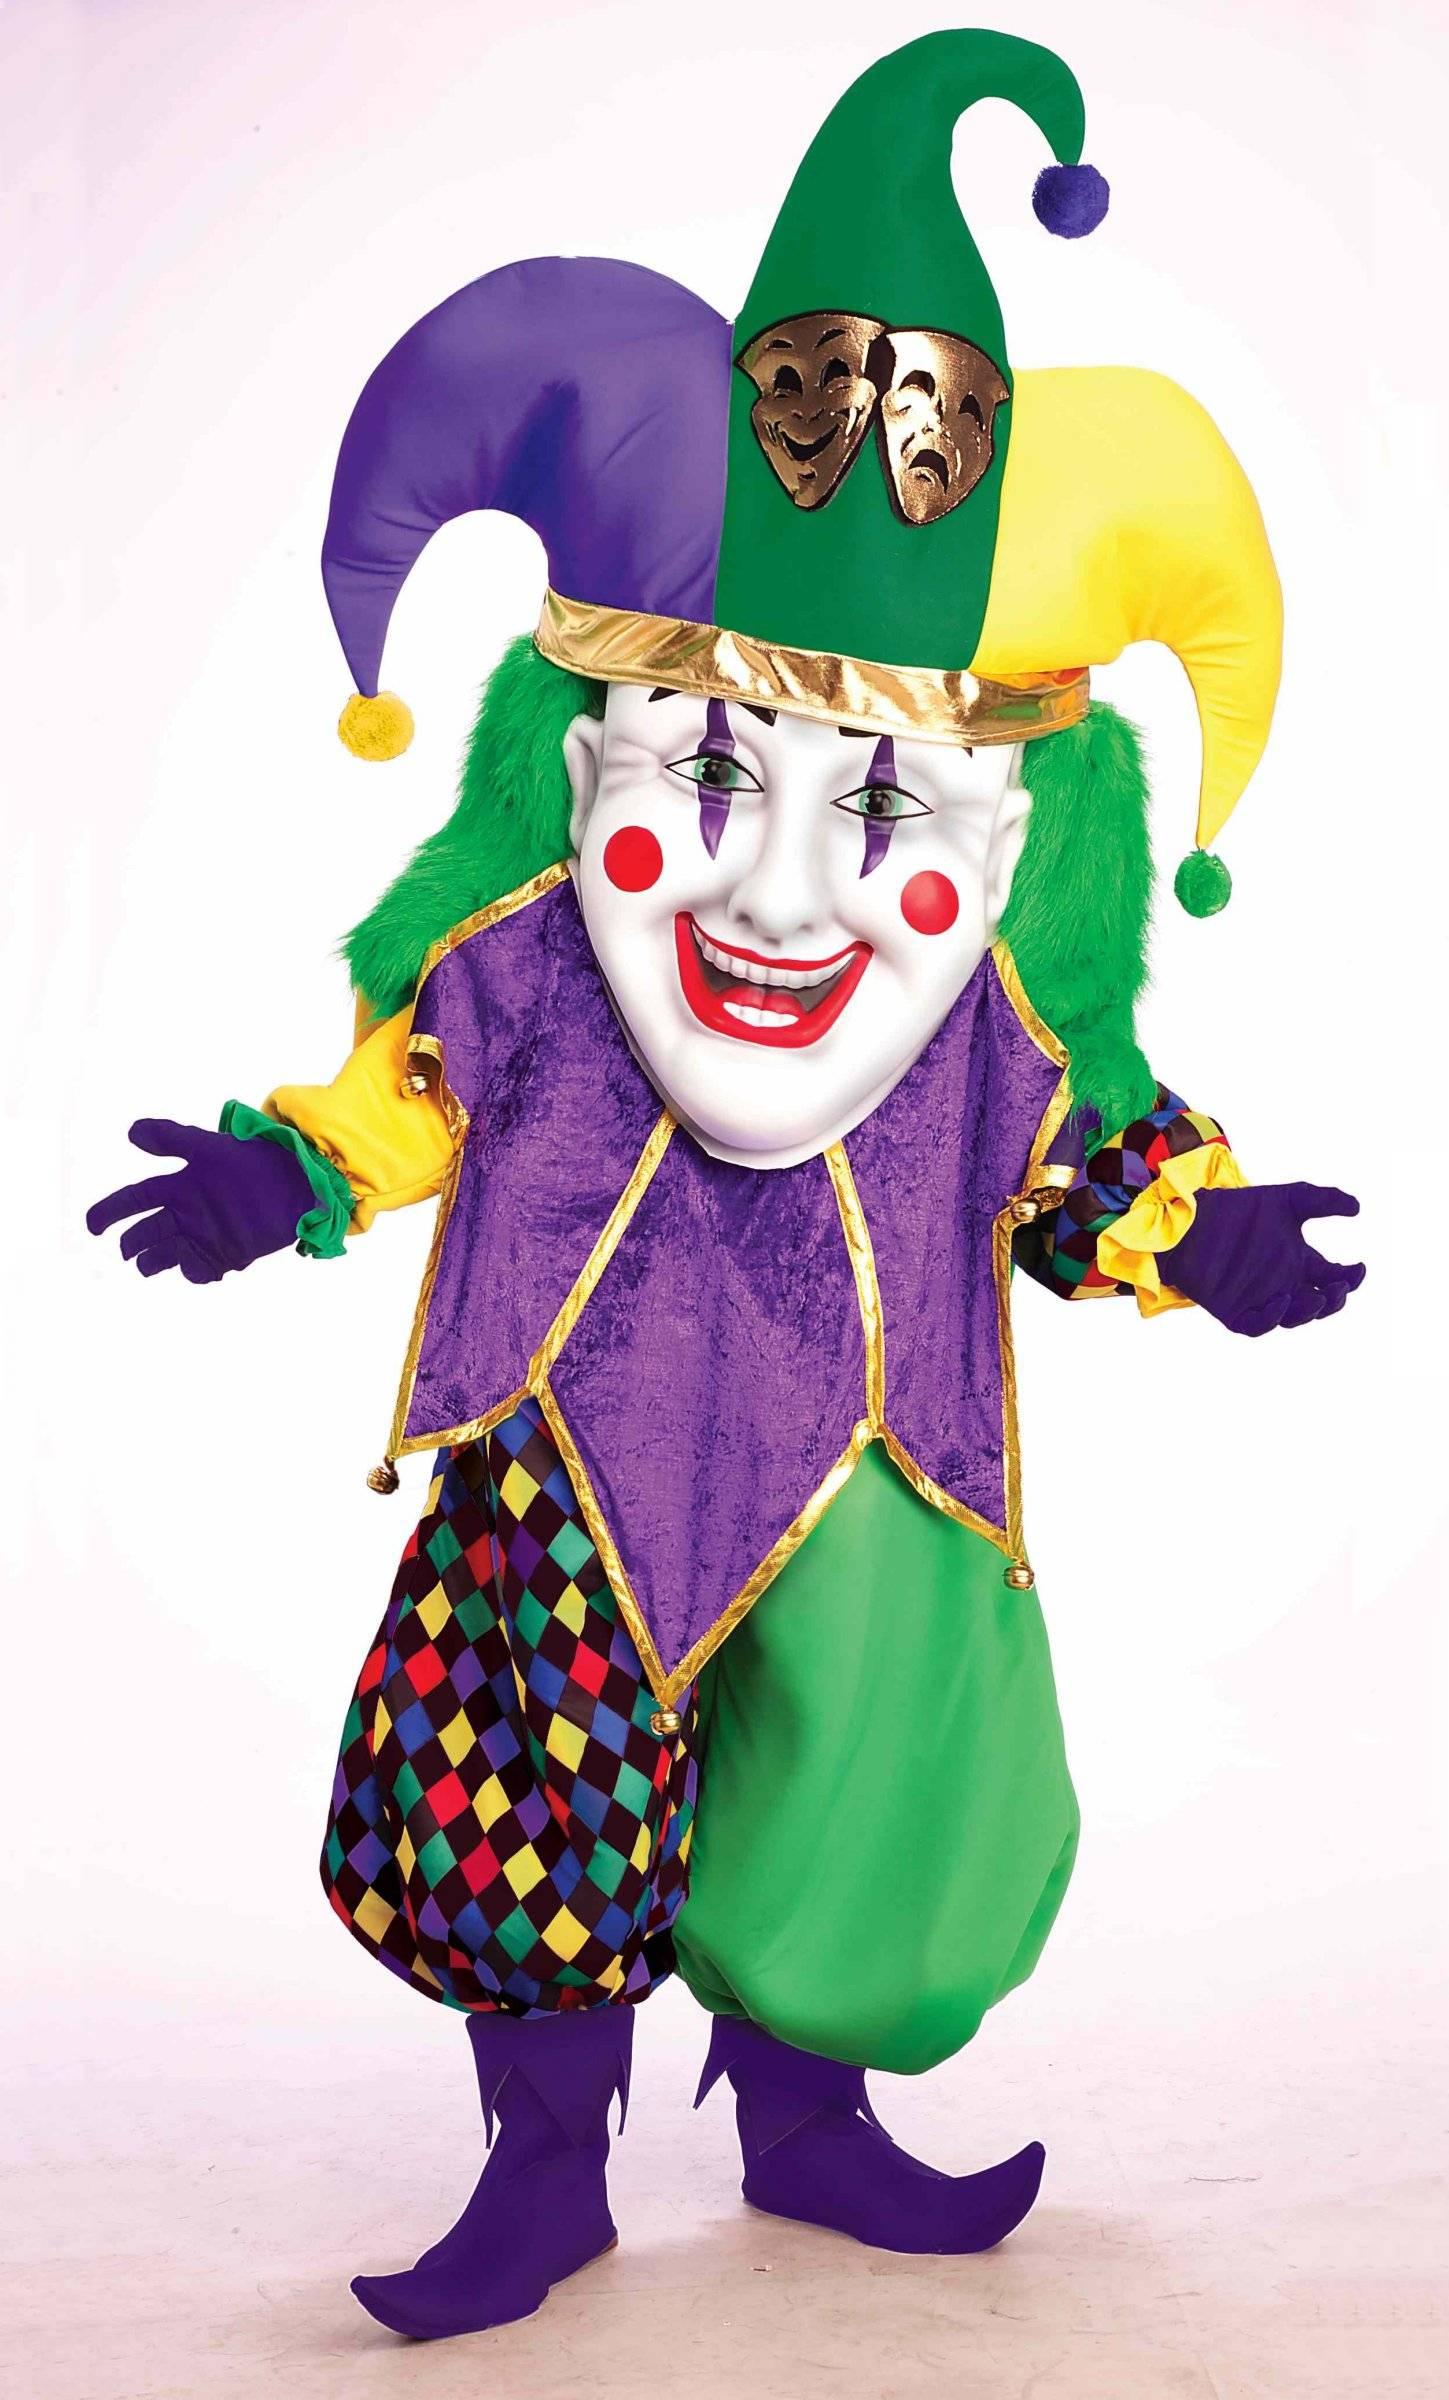 Costume fou du roi bouffon parade v39410 - Maquillage chapelier fou ...